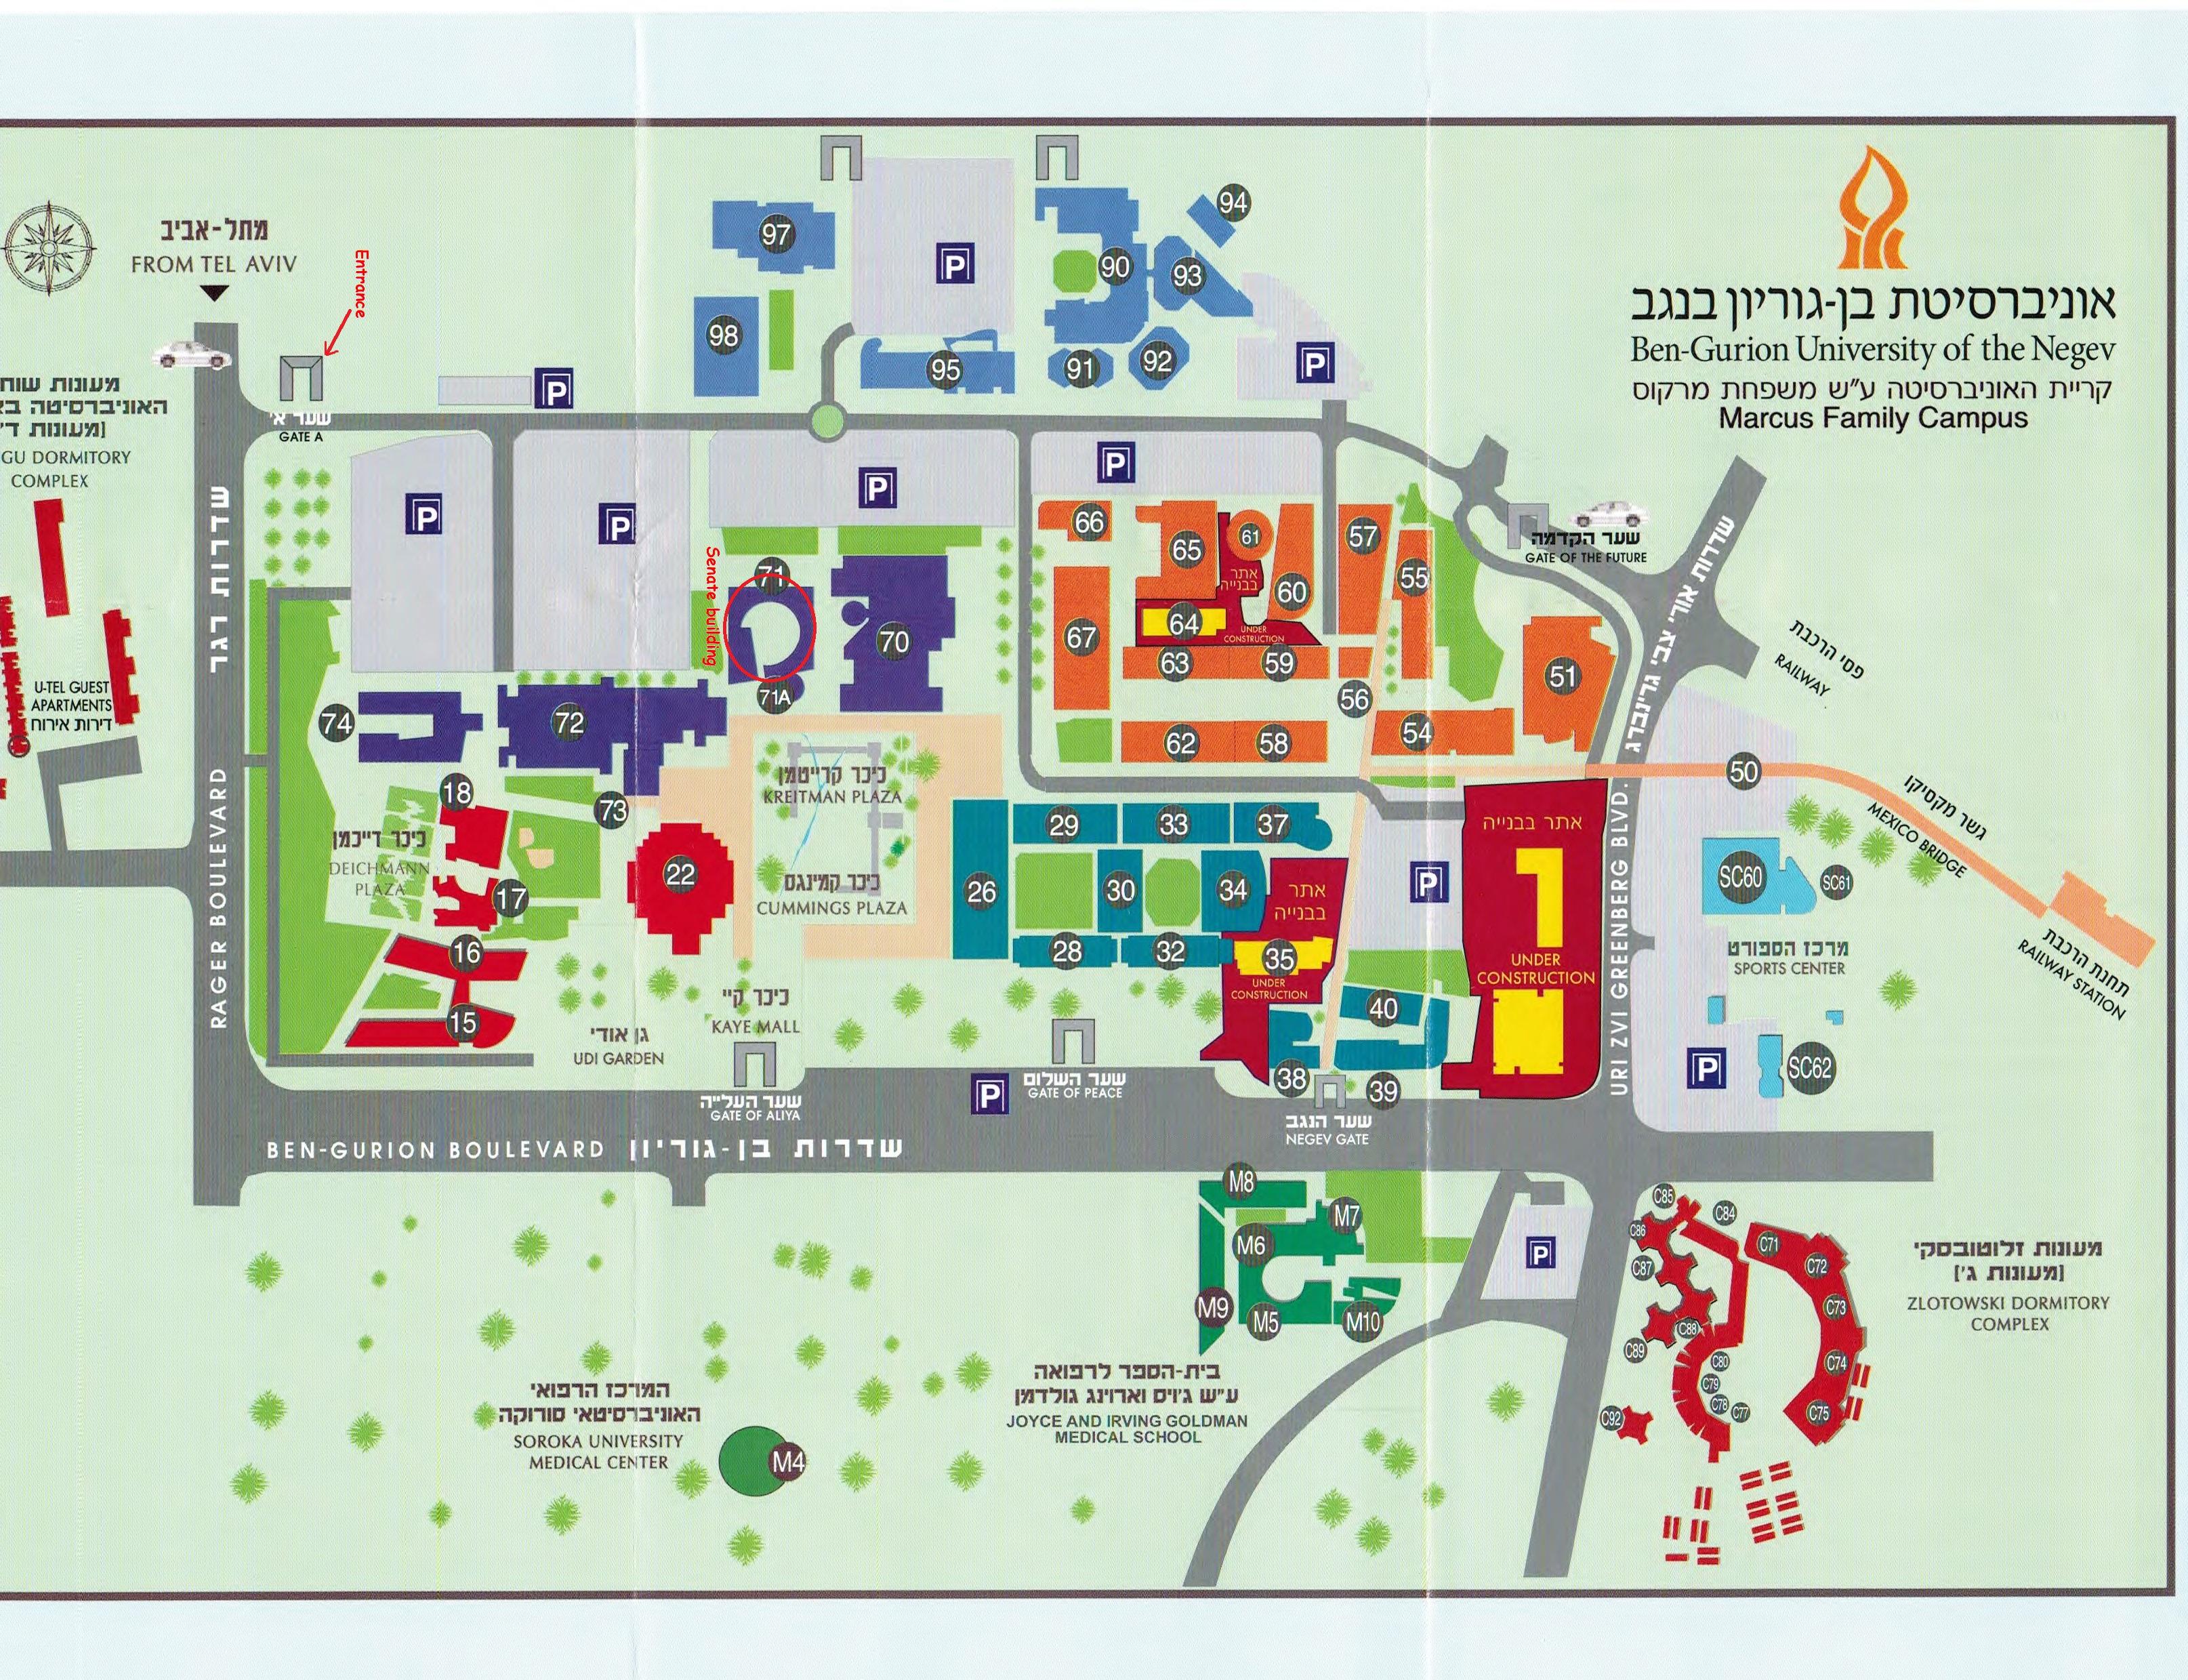 tel aviv university campus map Cmcw Maps tel aviv university campus map